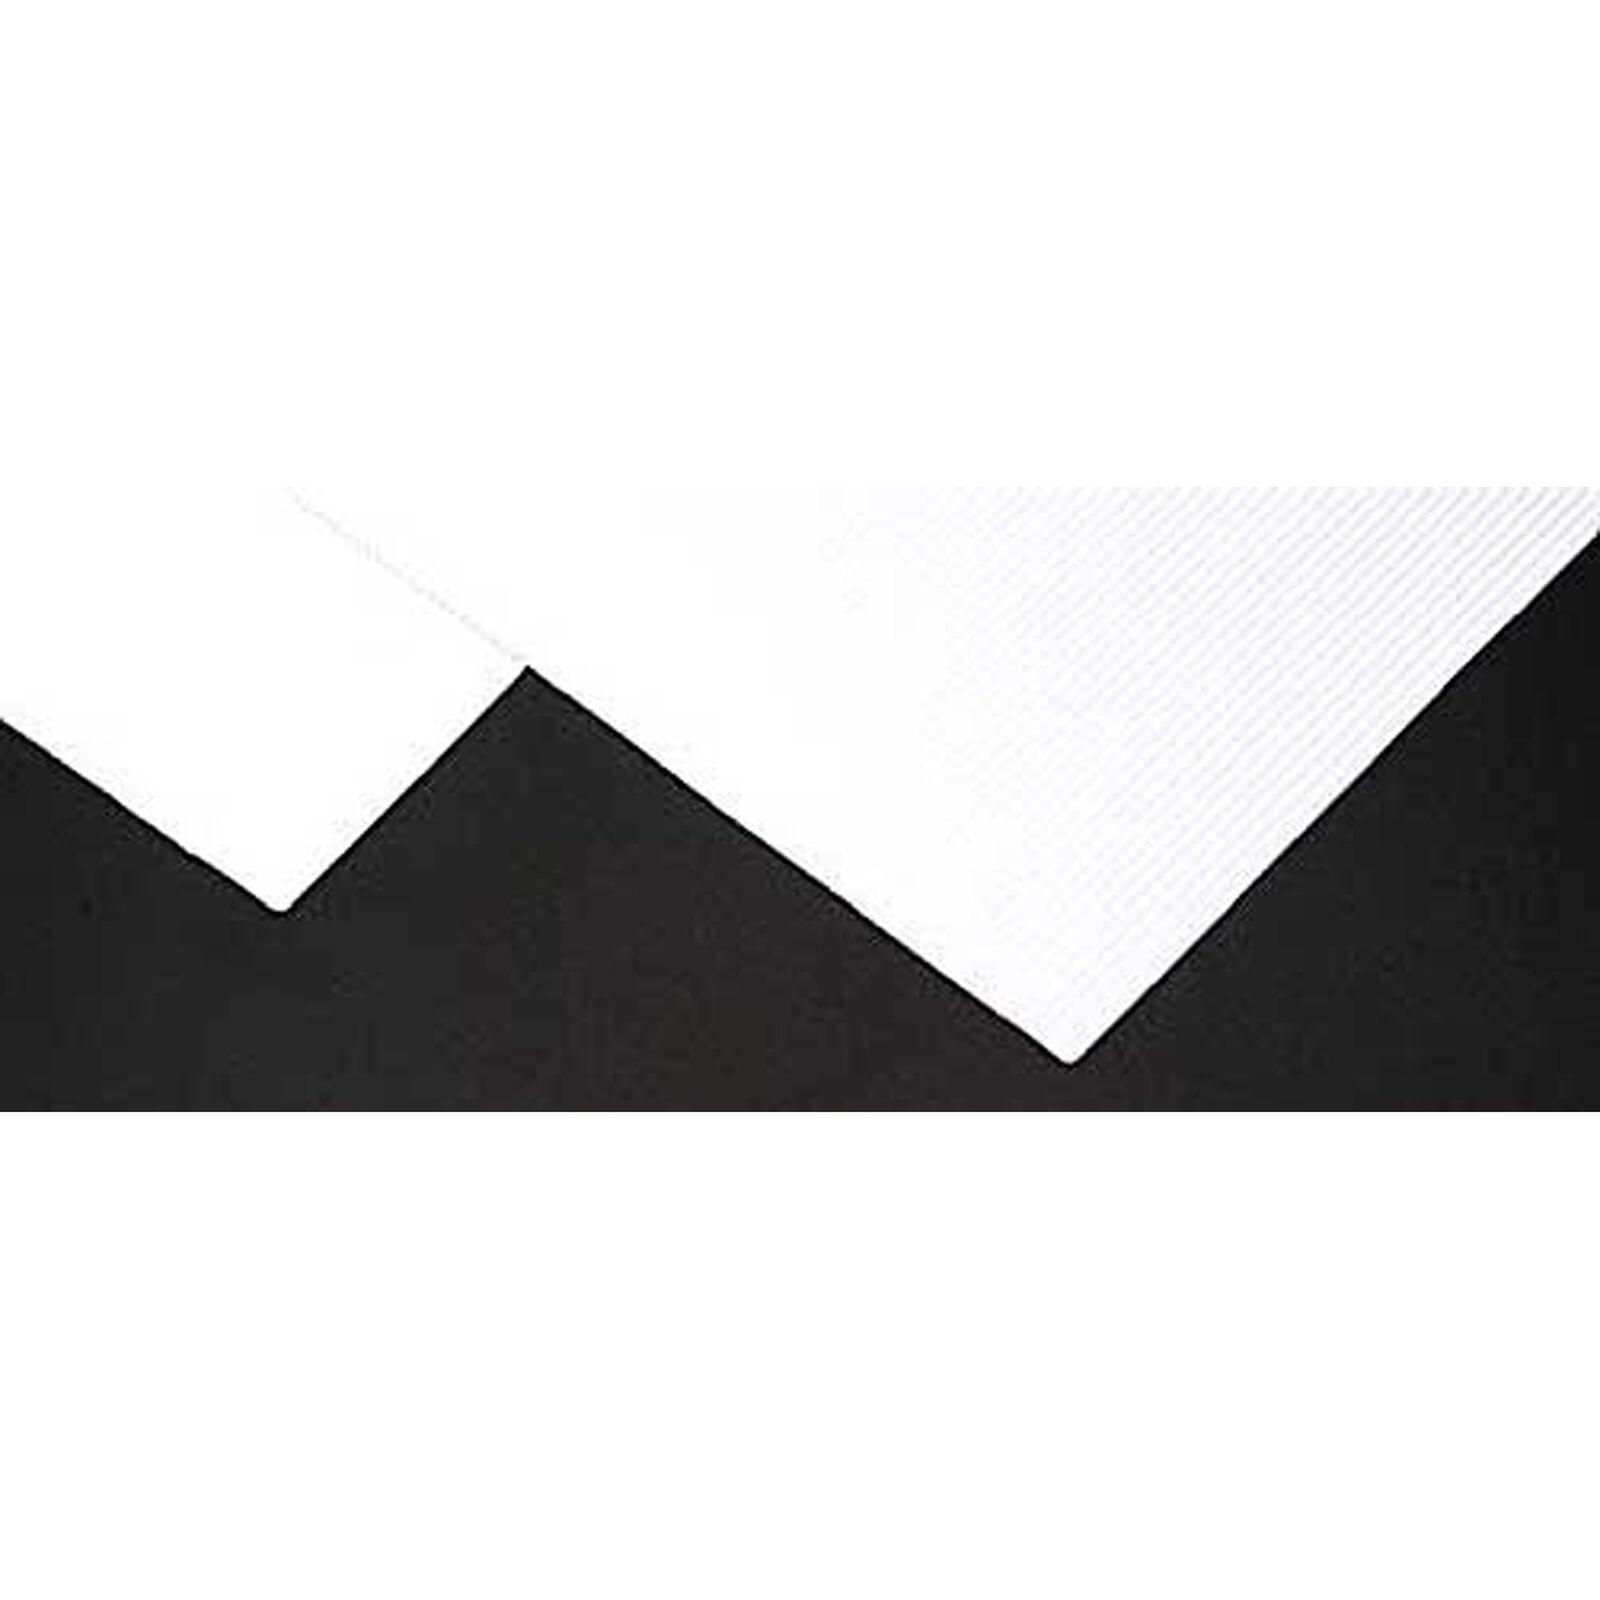 PS-11 HO Corrugated Sheets (2)